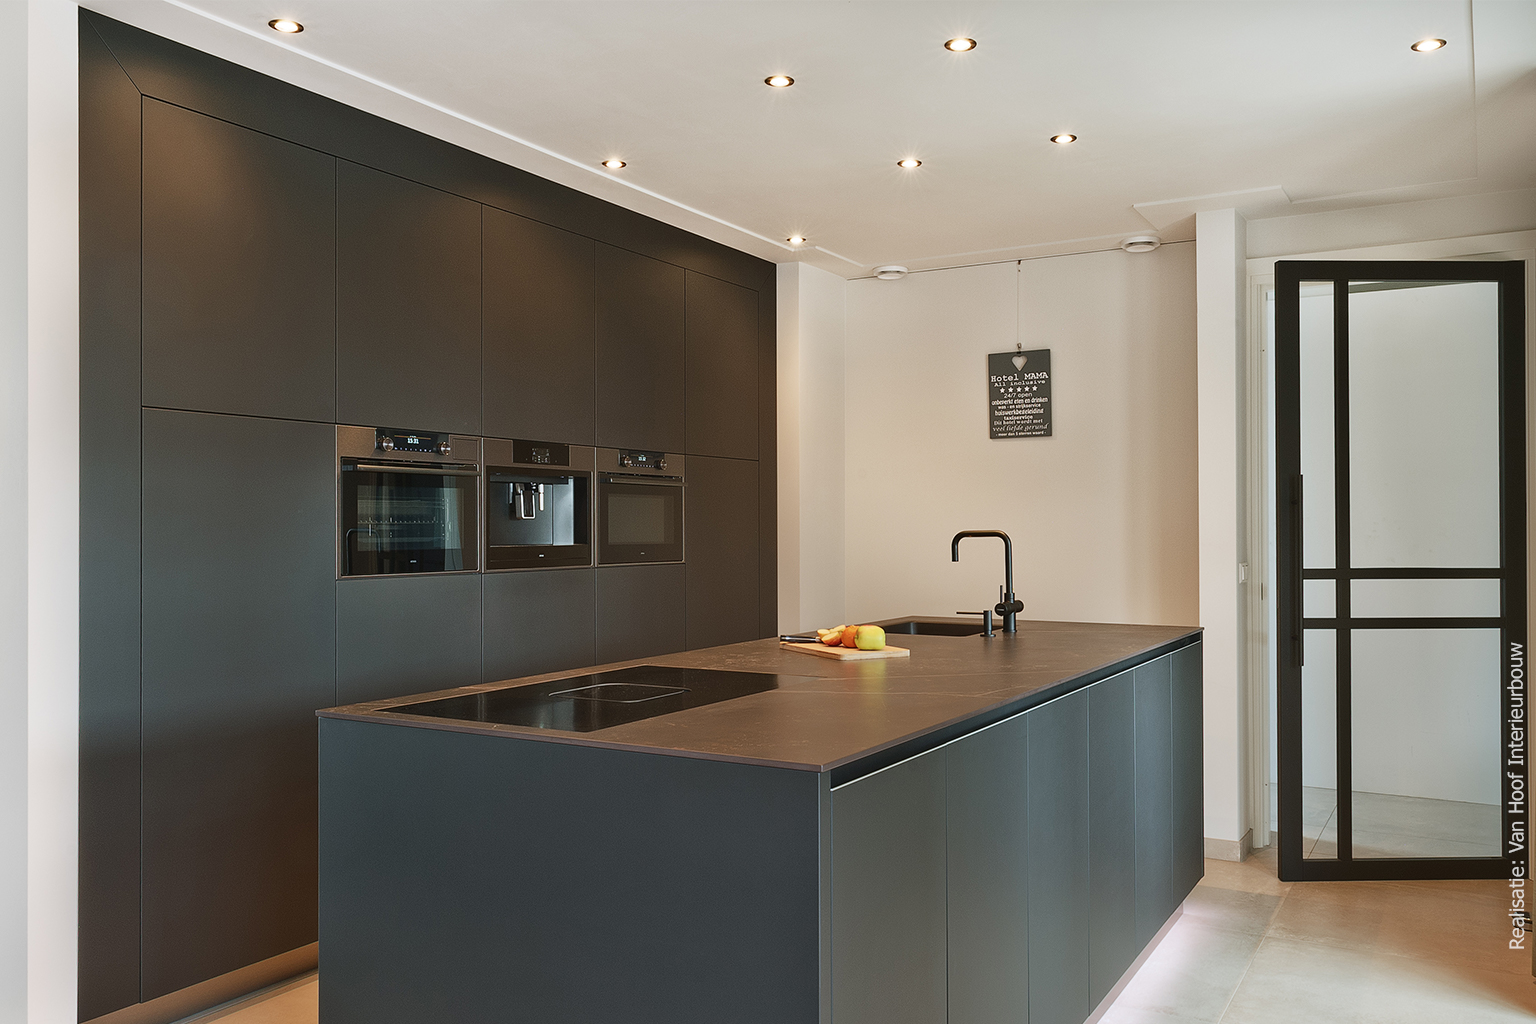 HM07 Piombo Keuken inspiratieafbeelding